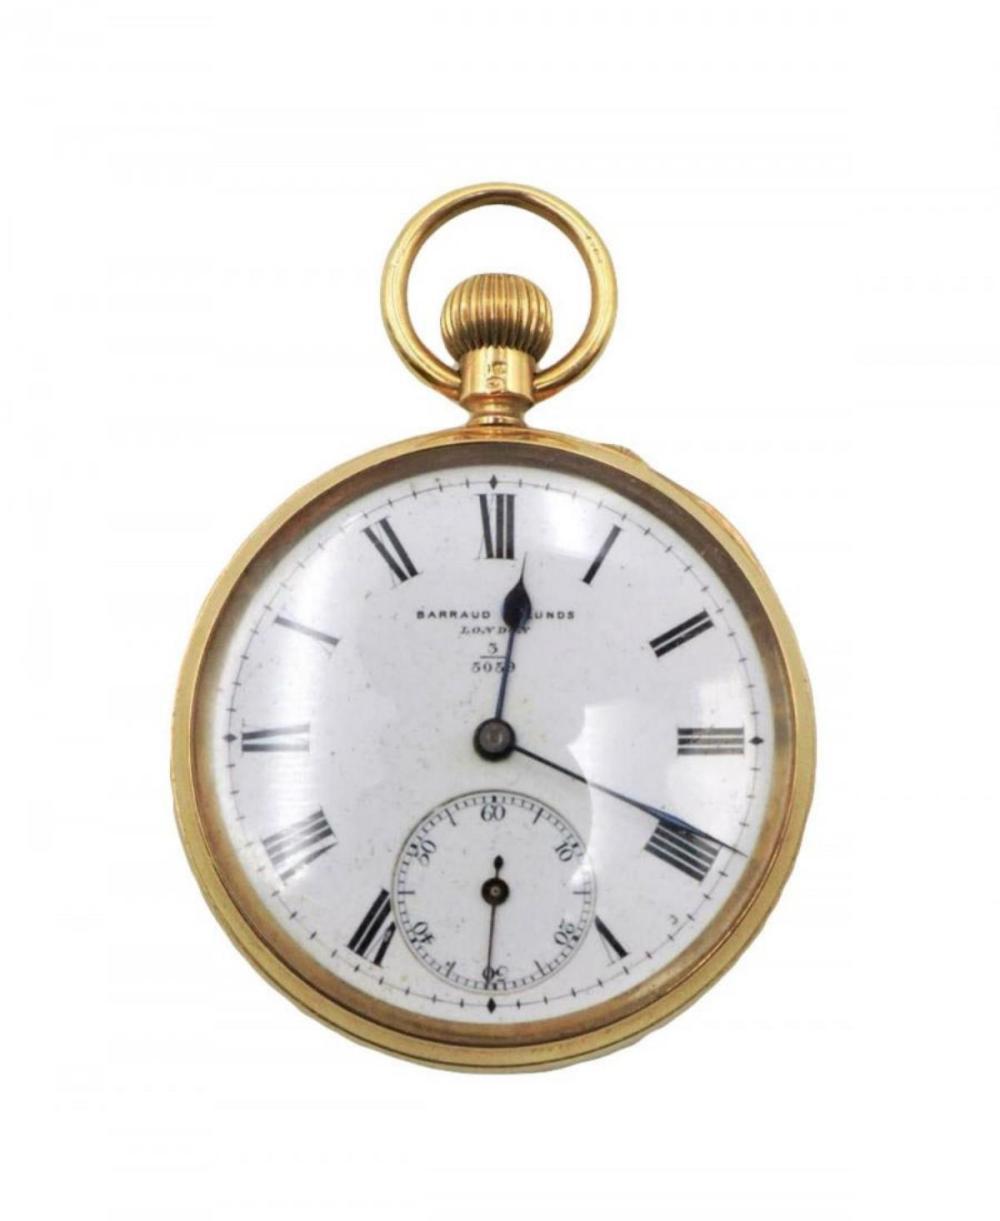 19th C. Barraud & Lunds 18Kt Pocket Watch